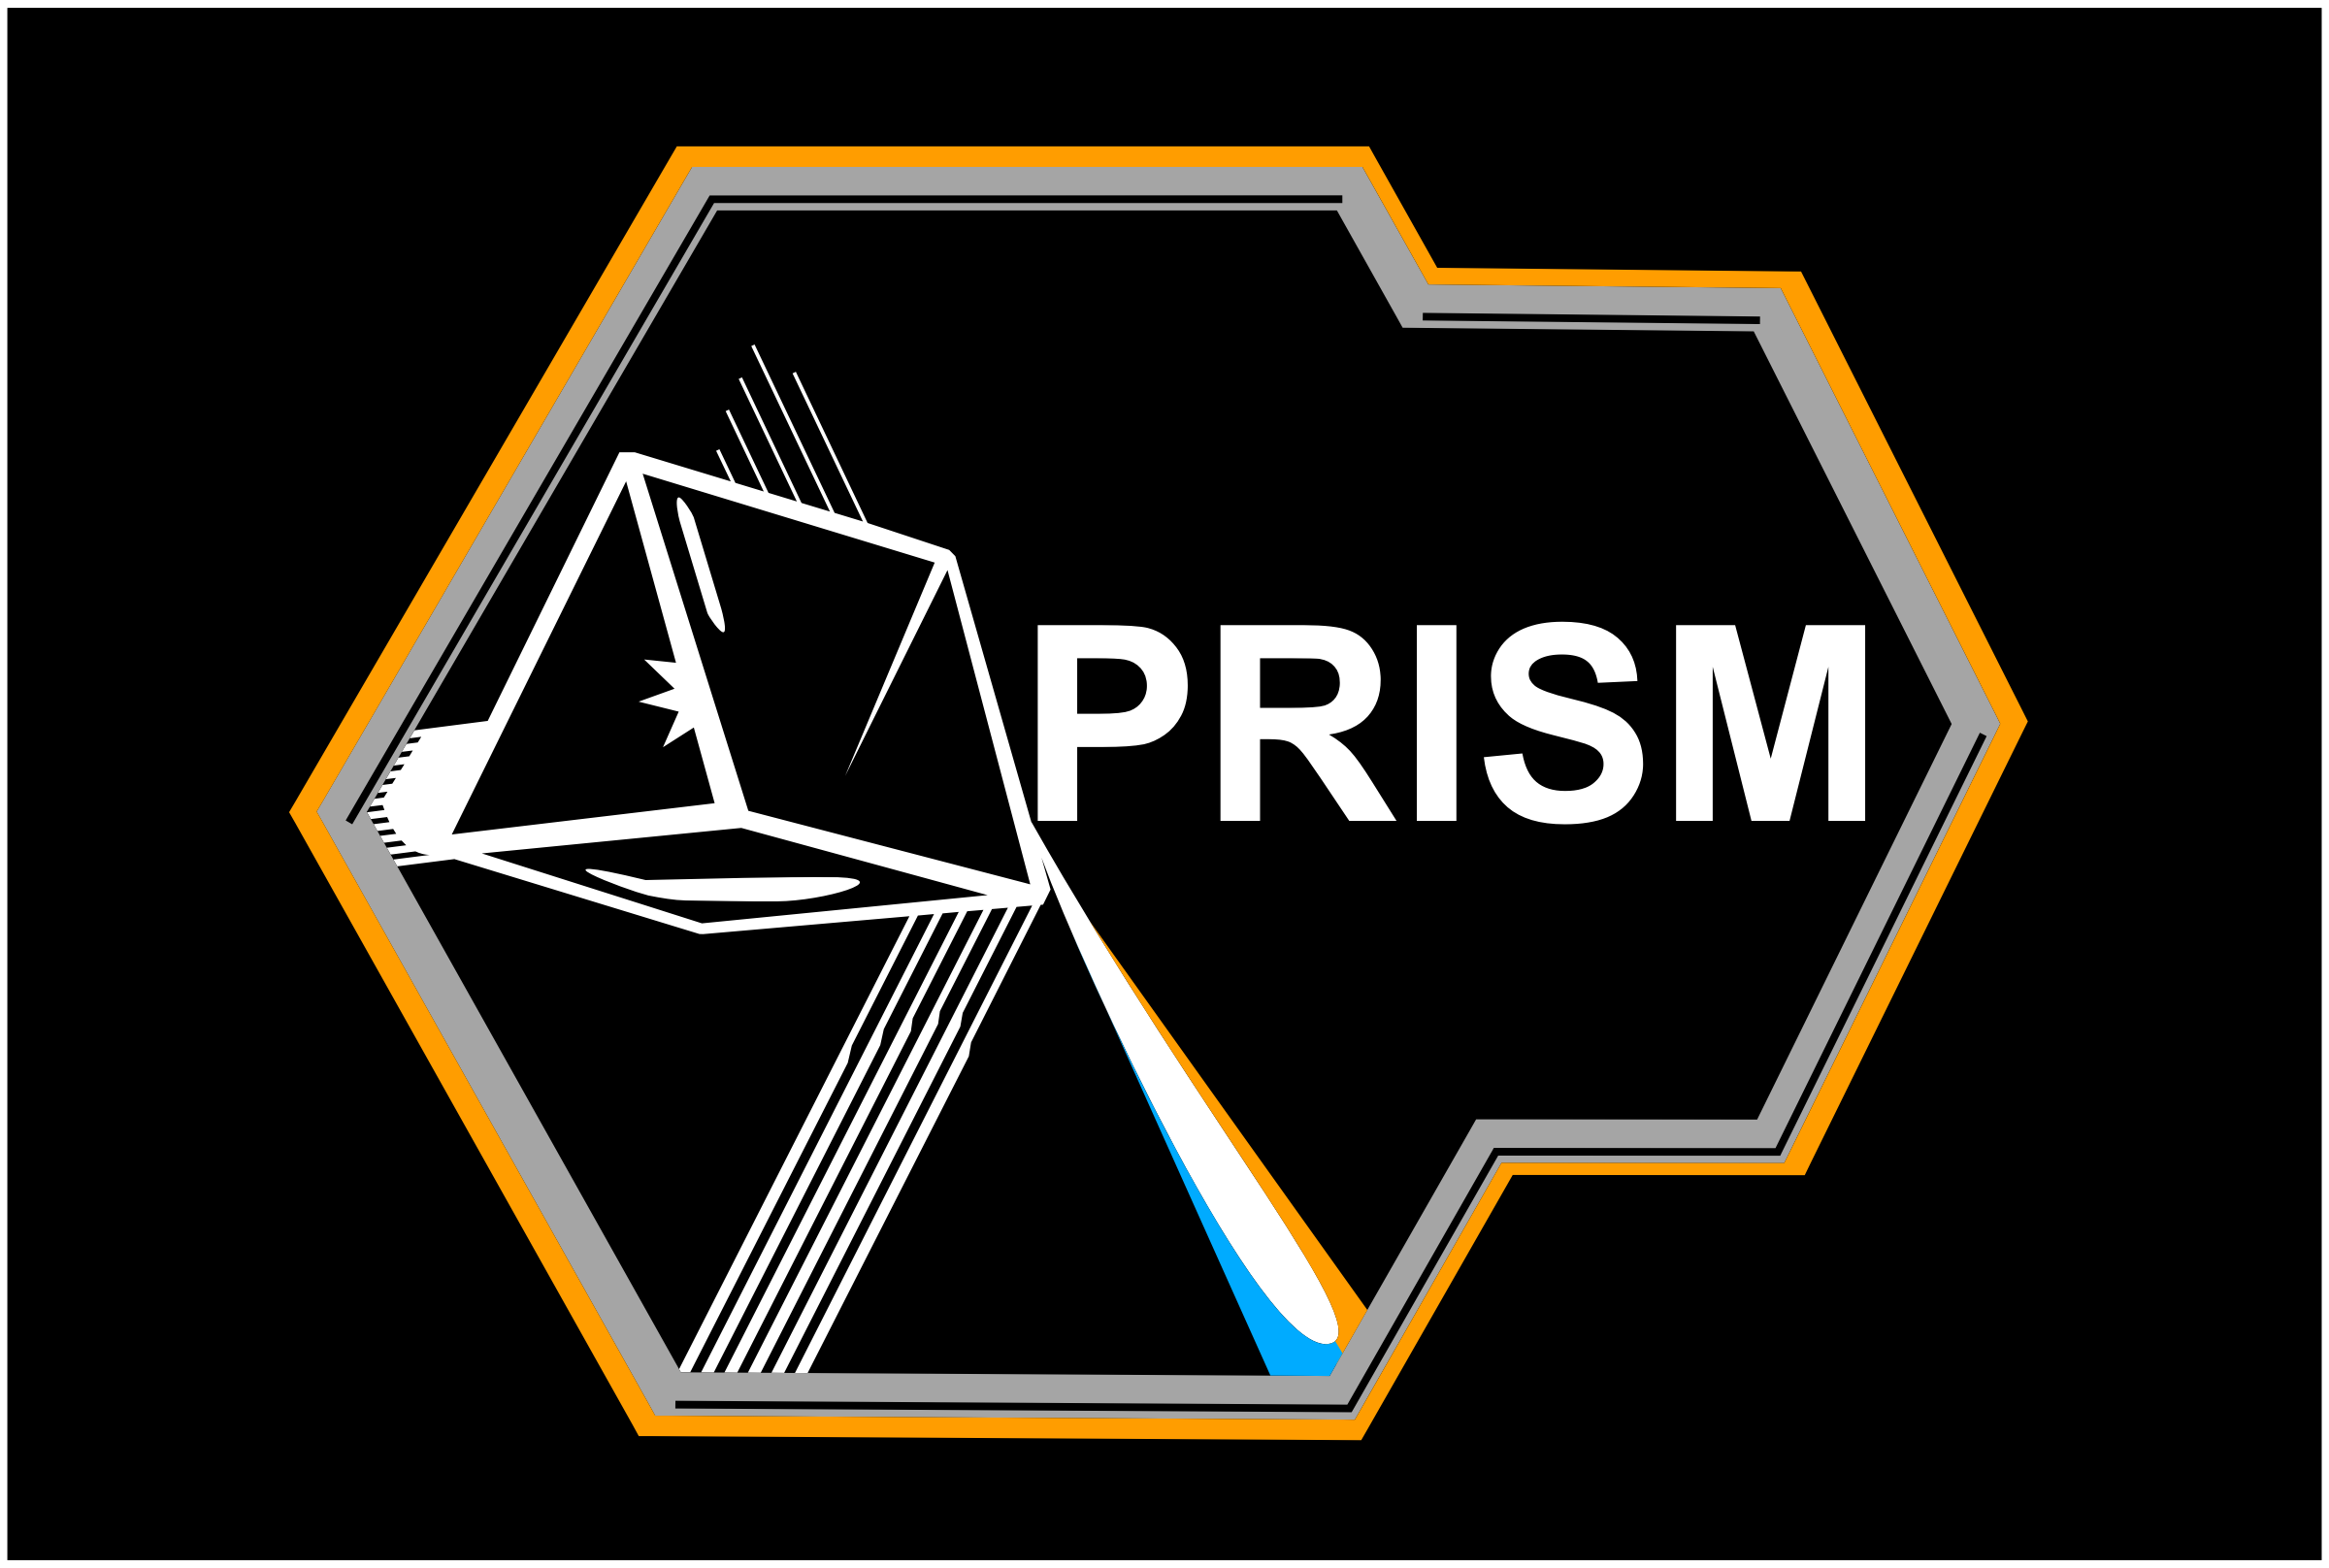 Prism Logo photo - 1